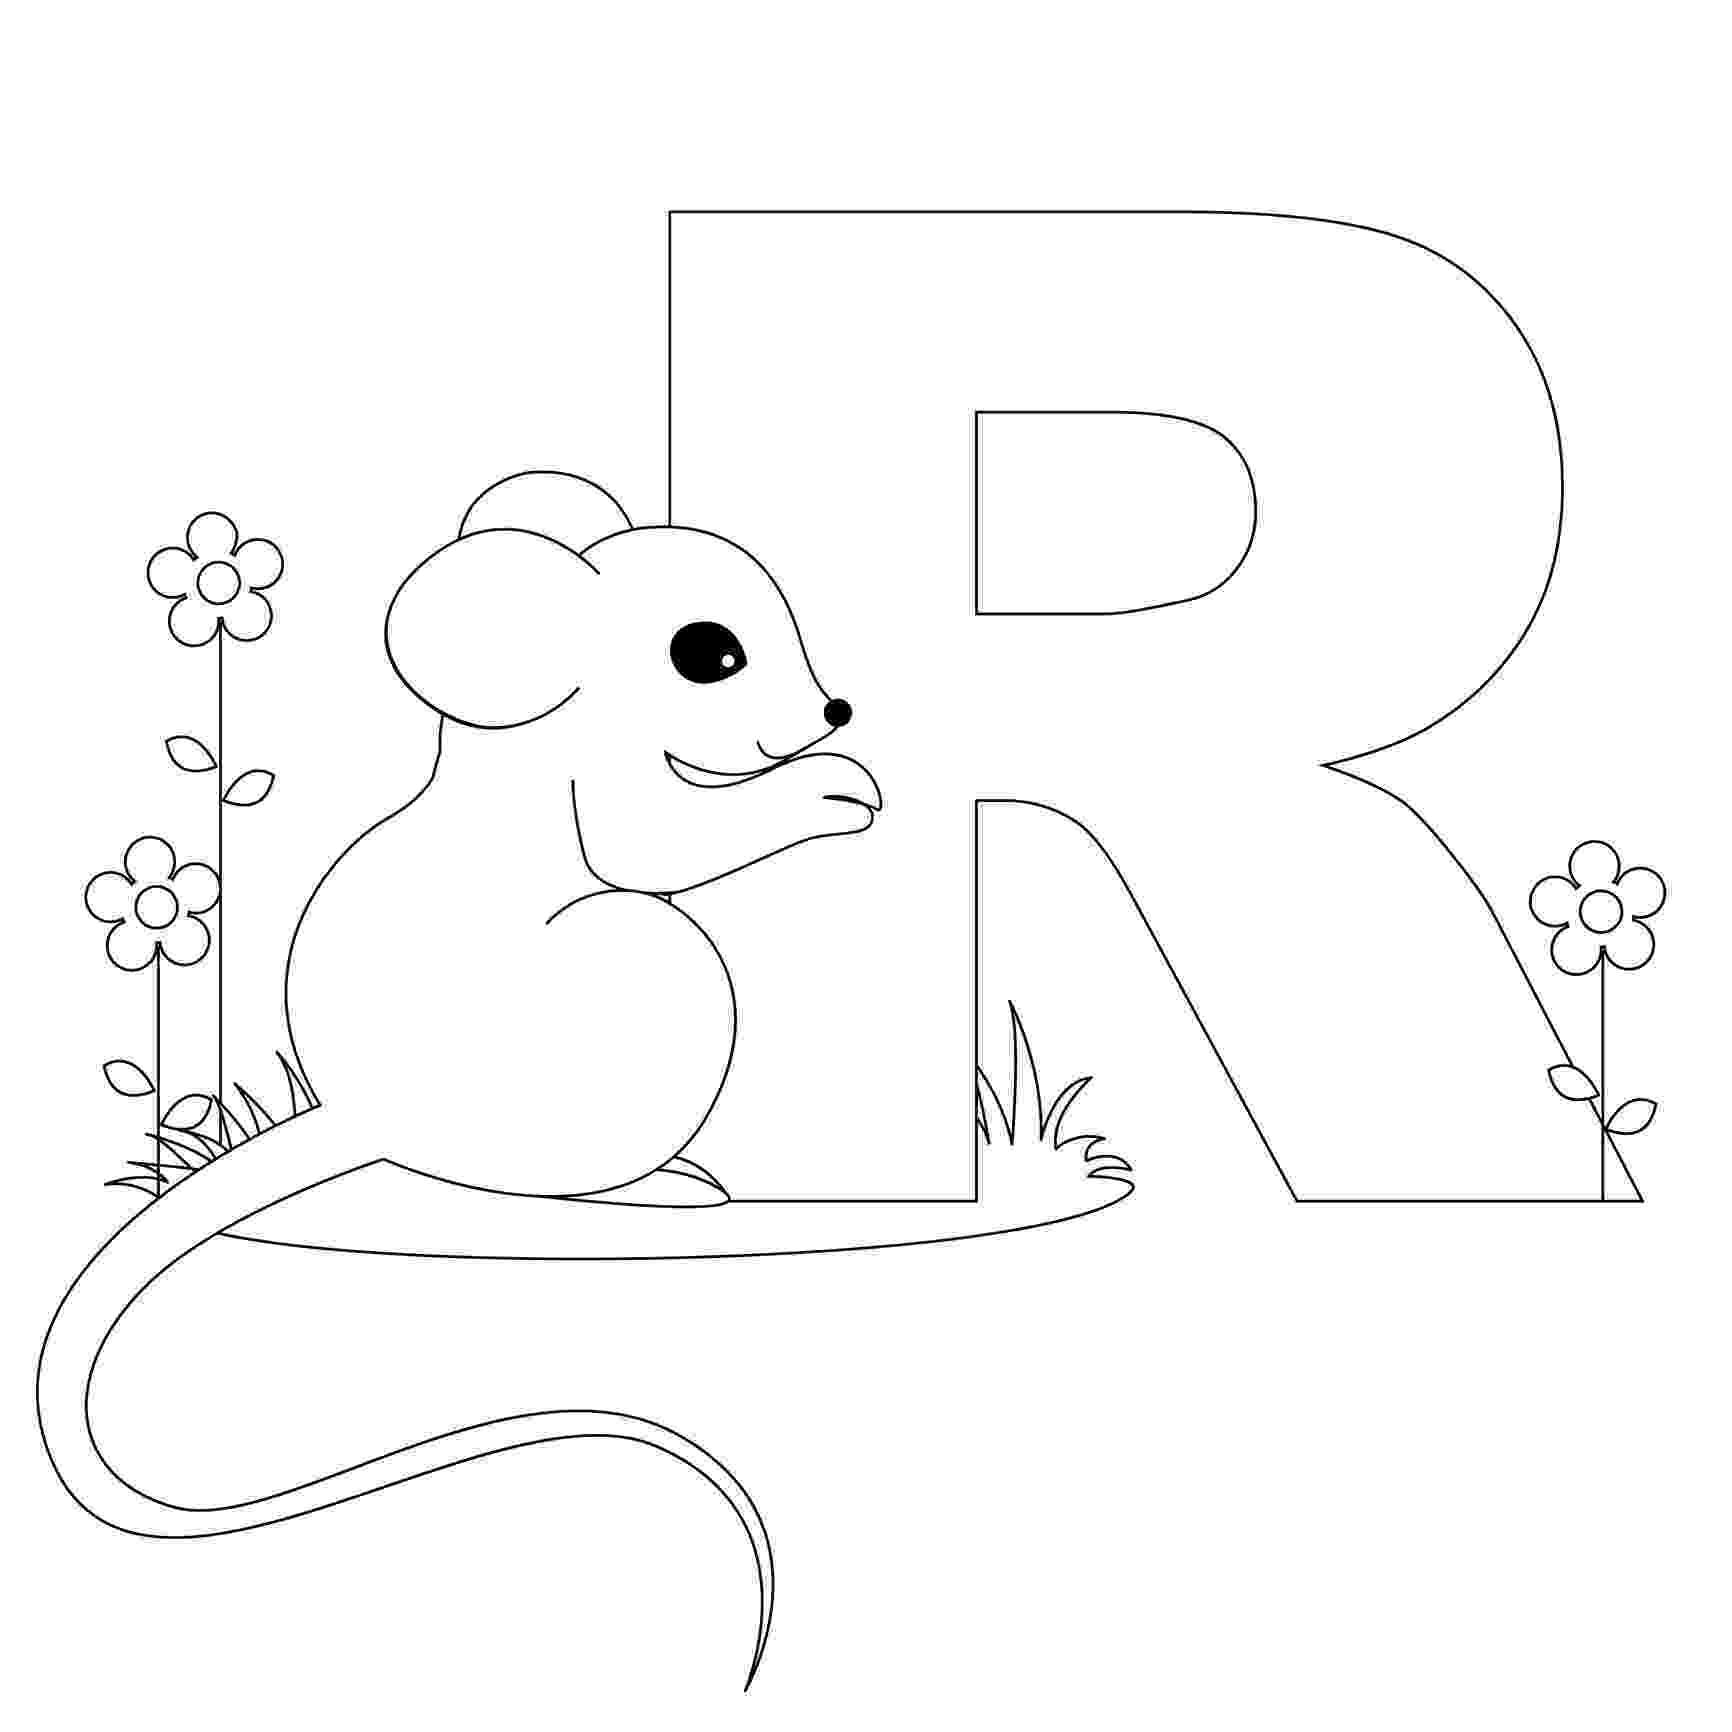 coloring animal alphabet free printable alphabet coloring pages for kids best coloring alphabet animal 1 1